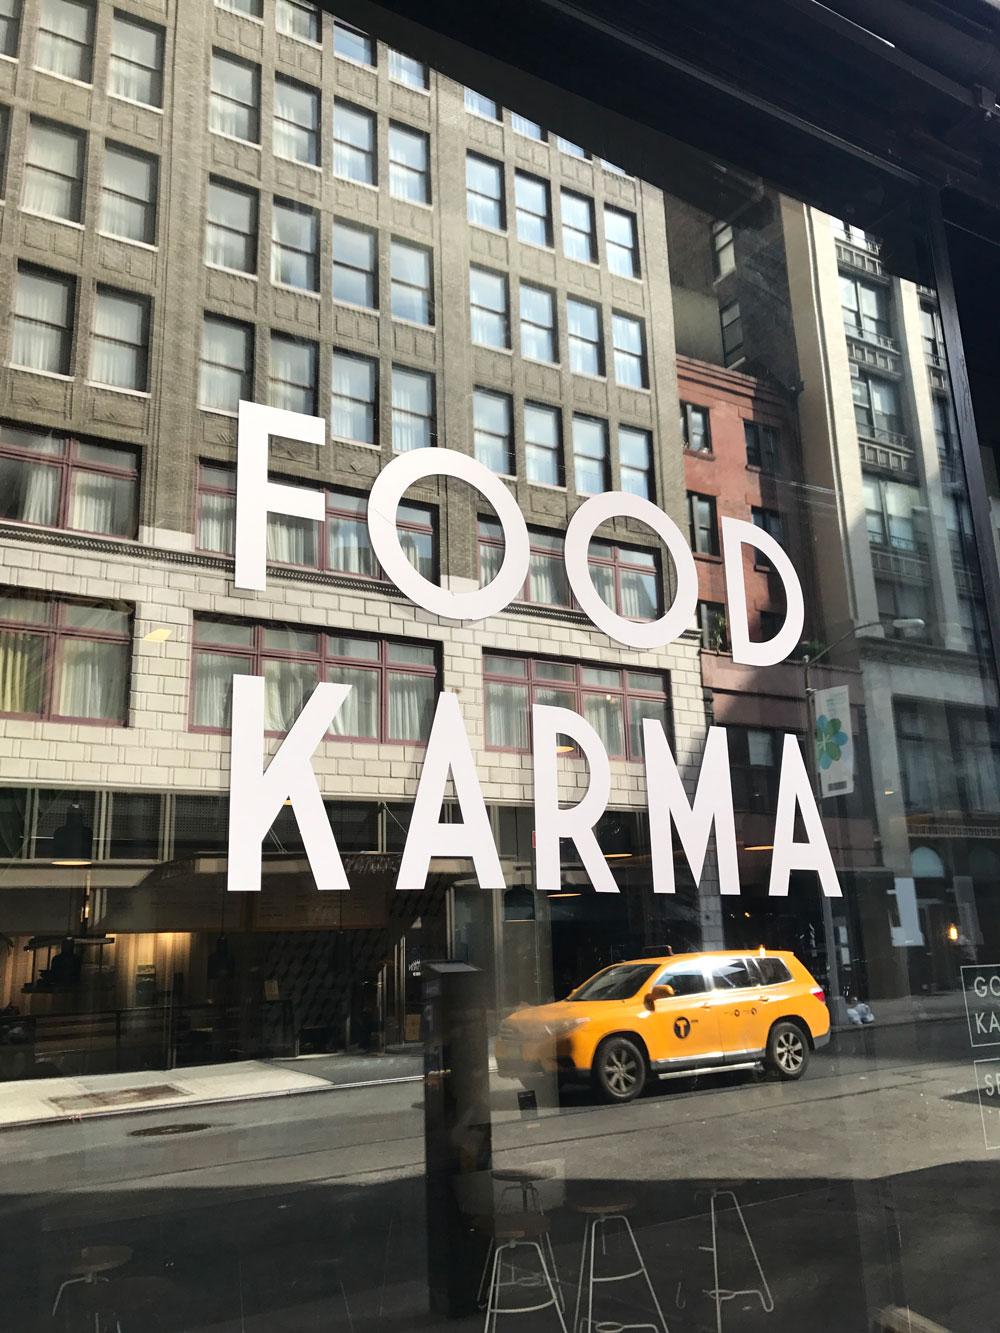 dominick-volini-inday-food-karma-3.jpg